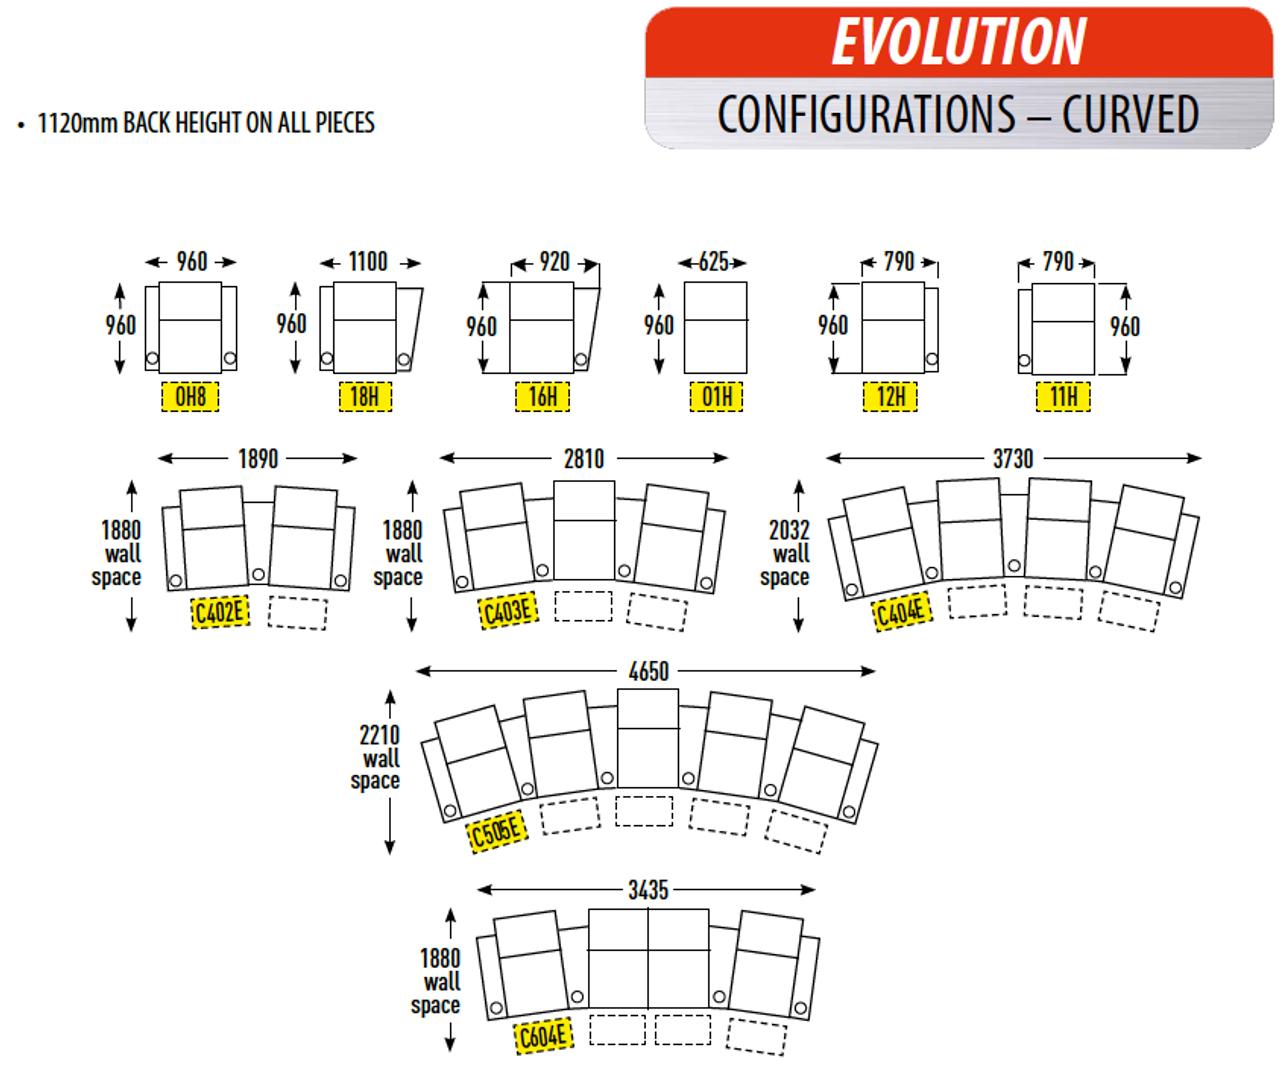 RowOne Evolution Premium Cinema Seating